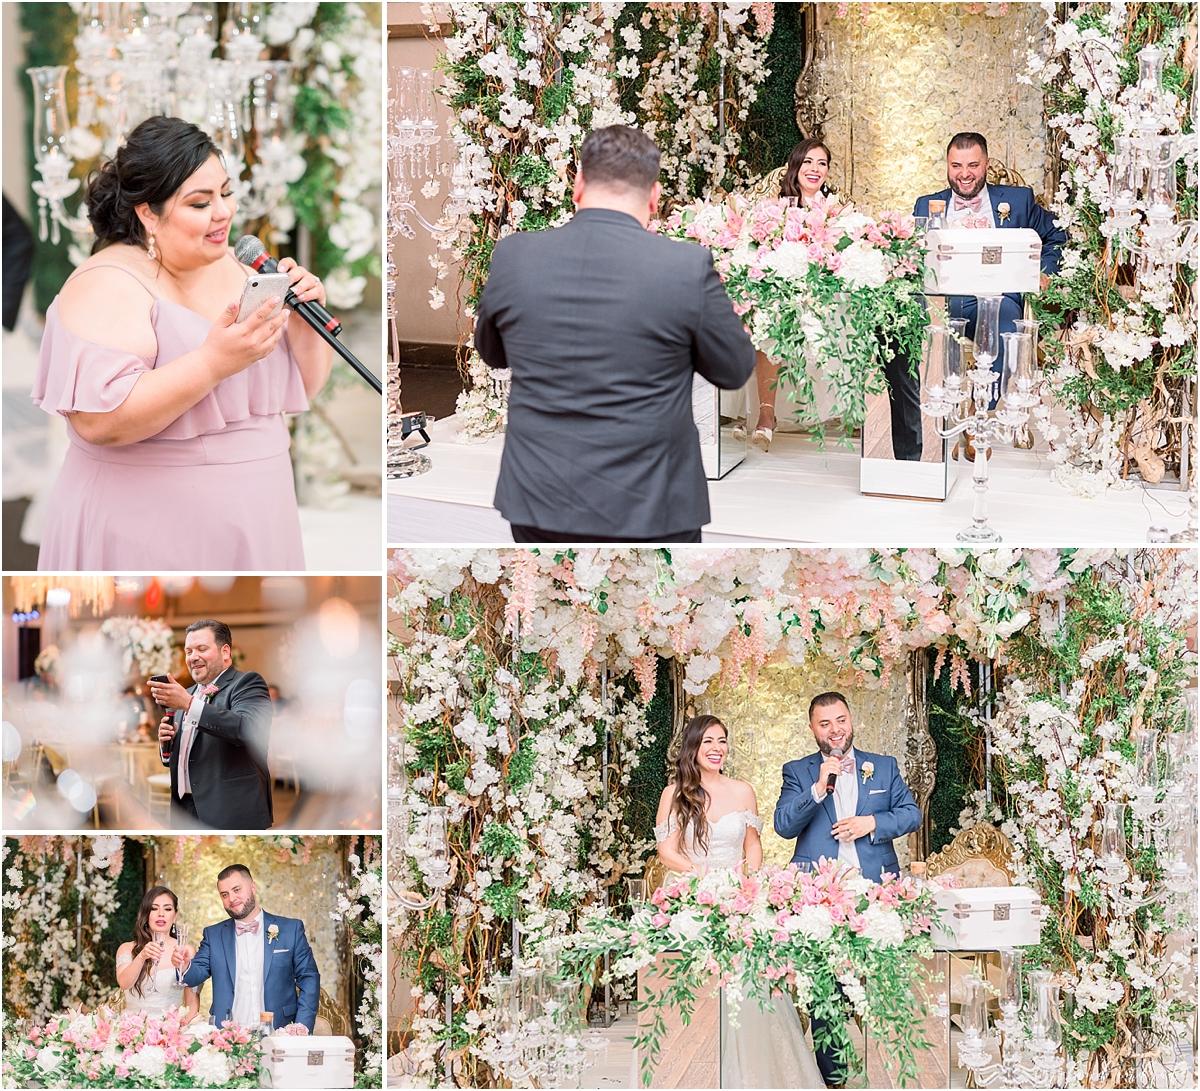 Rancho Los Guzman Wedding Joliet, Joliet Wedding, Joliet Wedding Photographer, Chicago Wedding Photographer, Best Photographer In Joliet, Best Photographer In Chicago, Light And Airy Photographer Chicago_0078.jpg